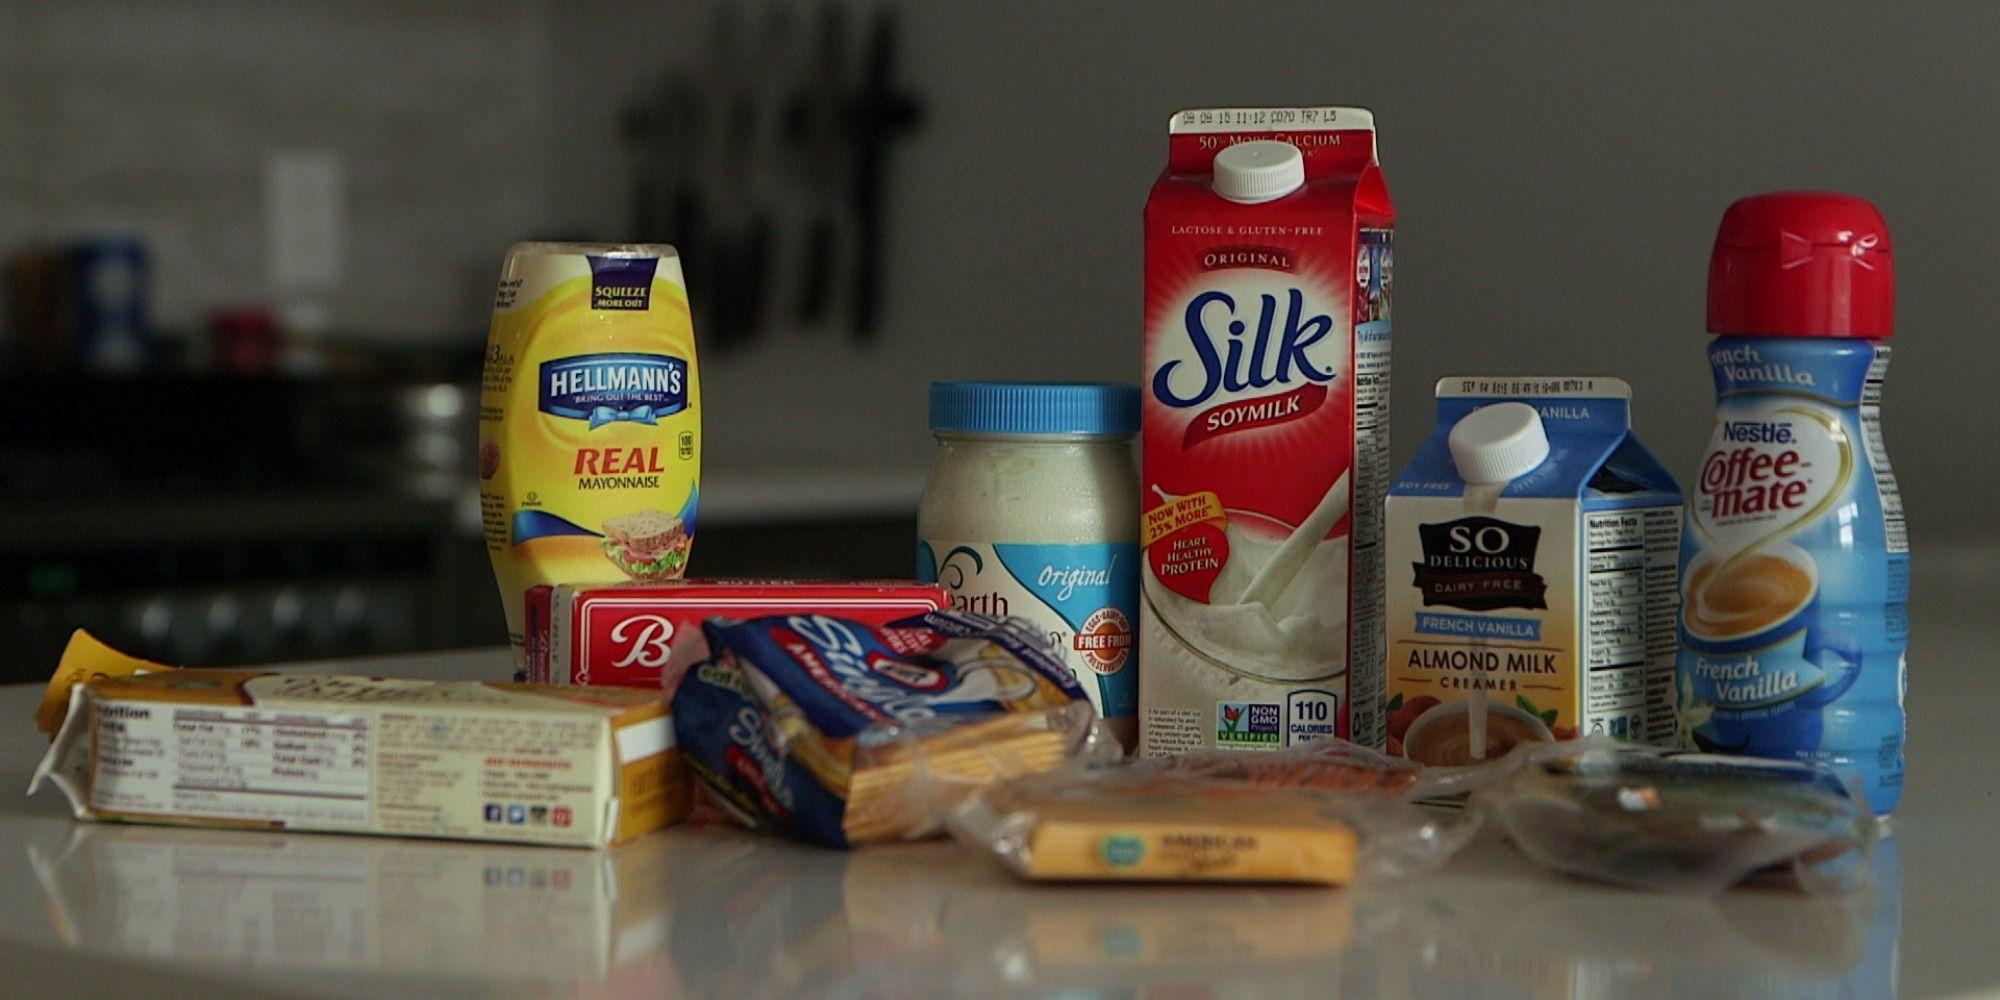 Do Vegan options ever taste better than the real thing? Find out here: http://www.huffingtonpost.com/2015/06/22/vegan-food-taste-test_n_7616862.html